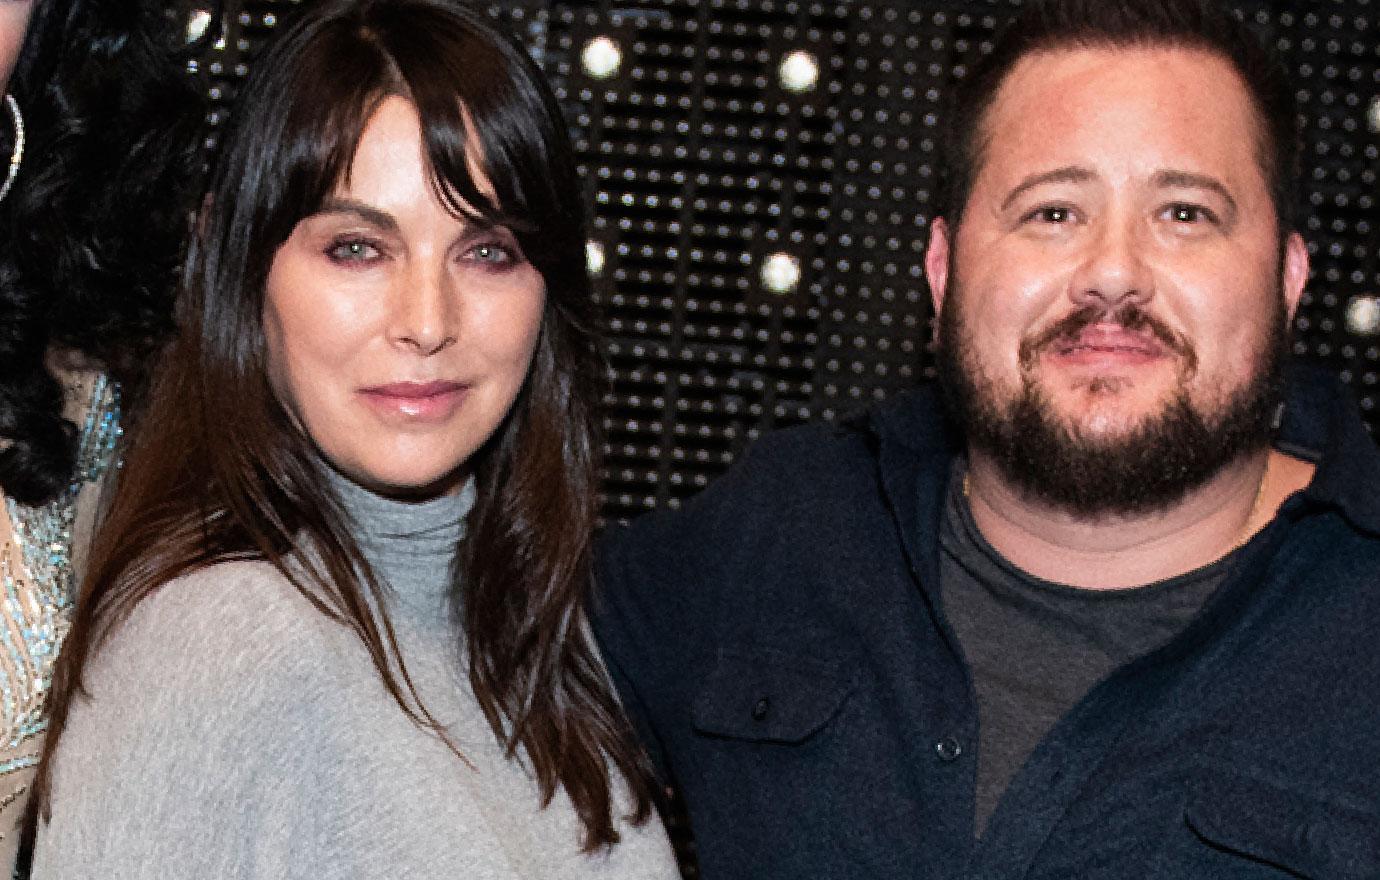 Chaz Bono New Girlfriend Ex Child Star Shara Blue Mathes